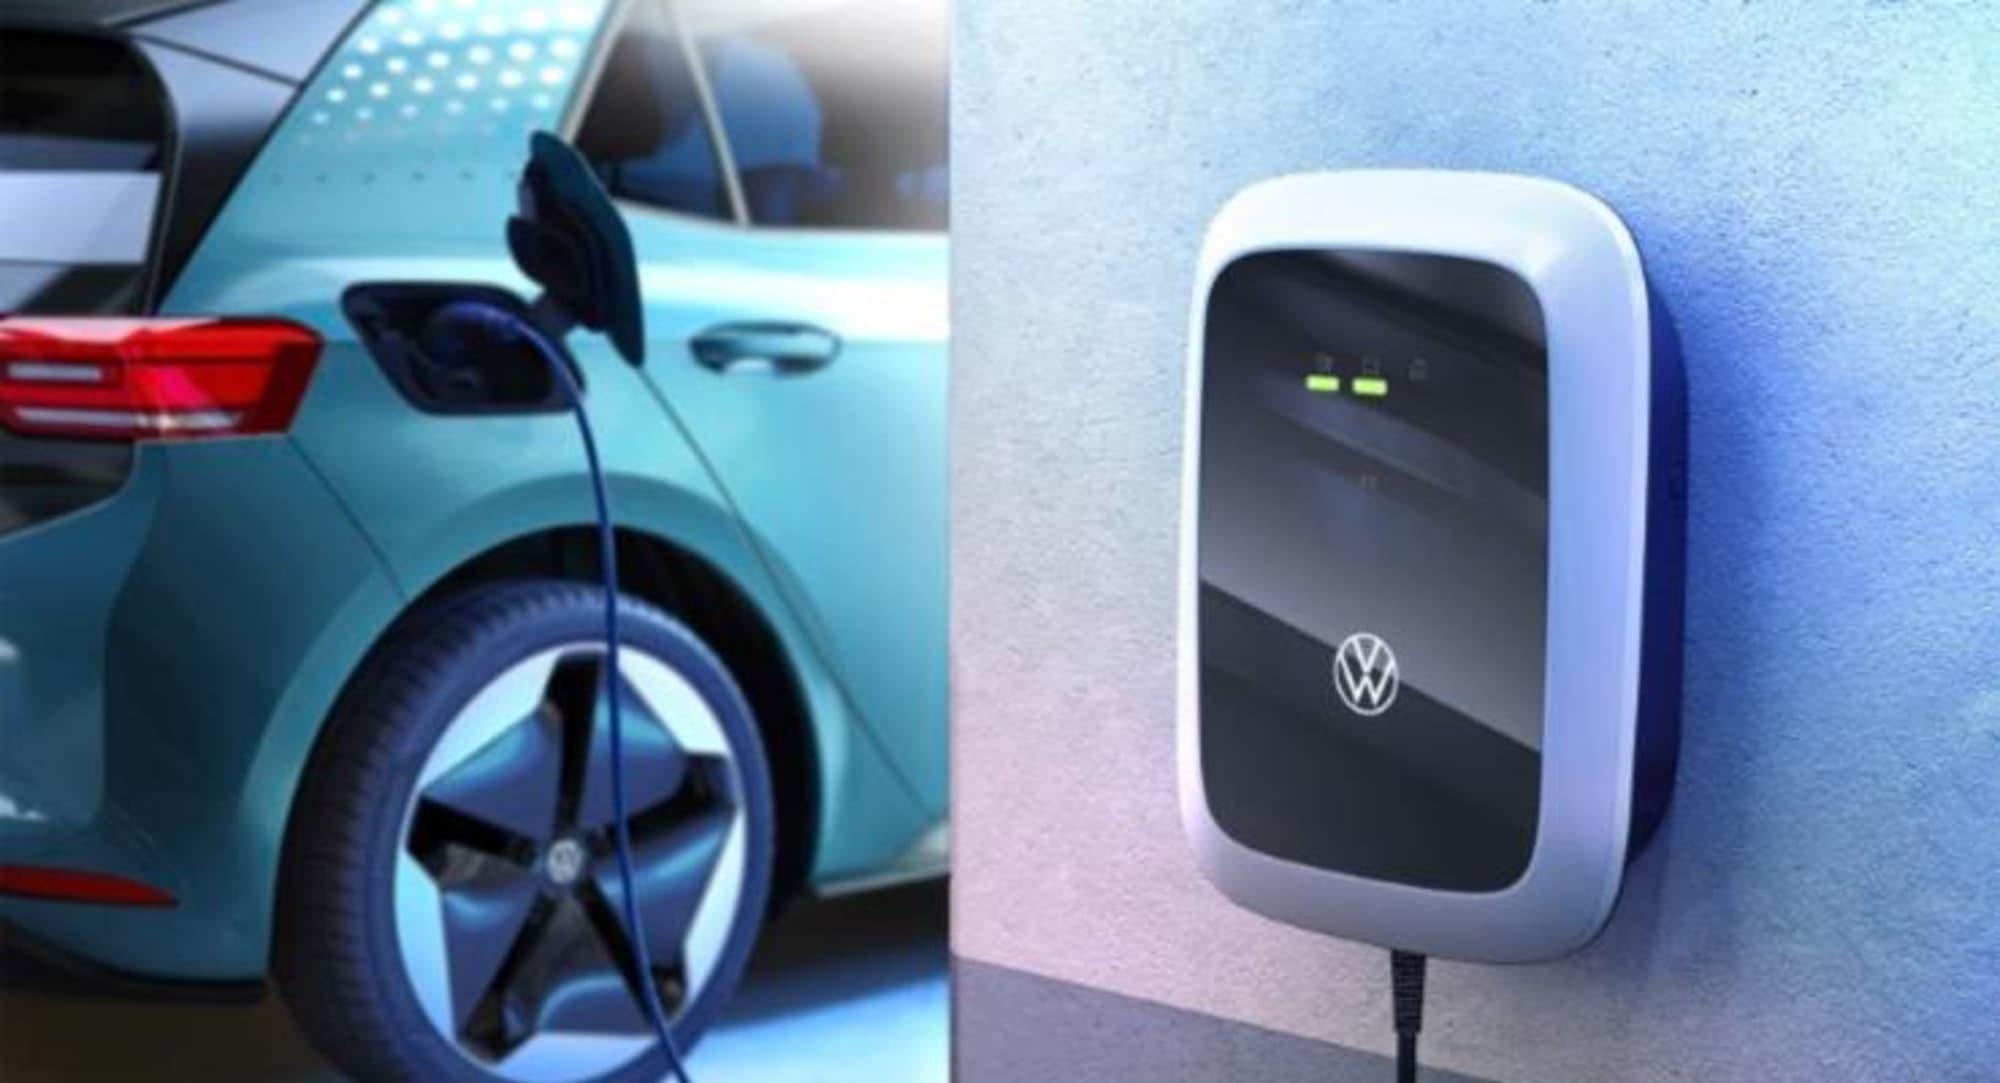 uygun-fiyatli-vw-id-charger-wallbox-avrupa-da-cikti[1]